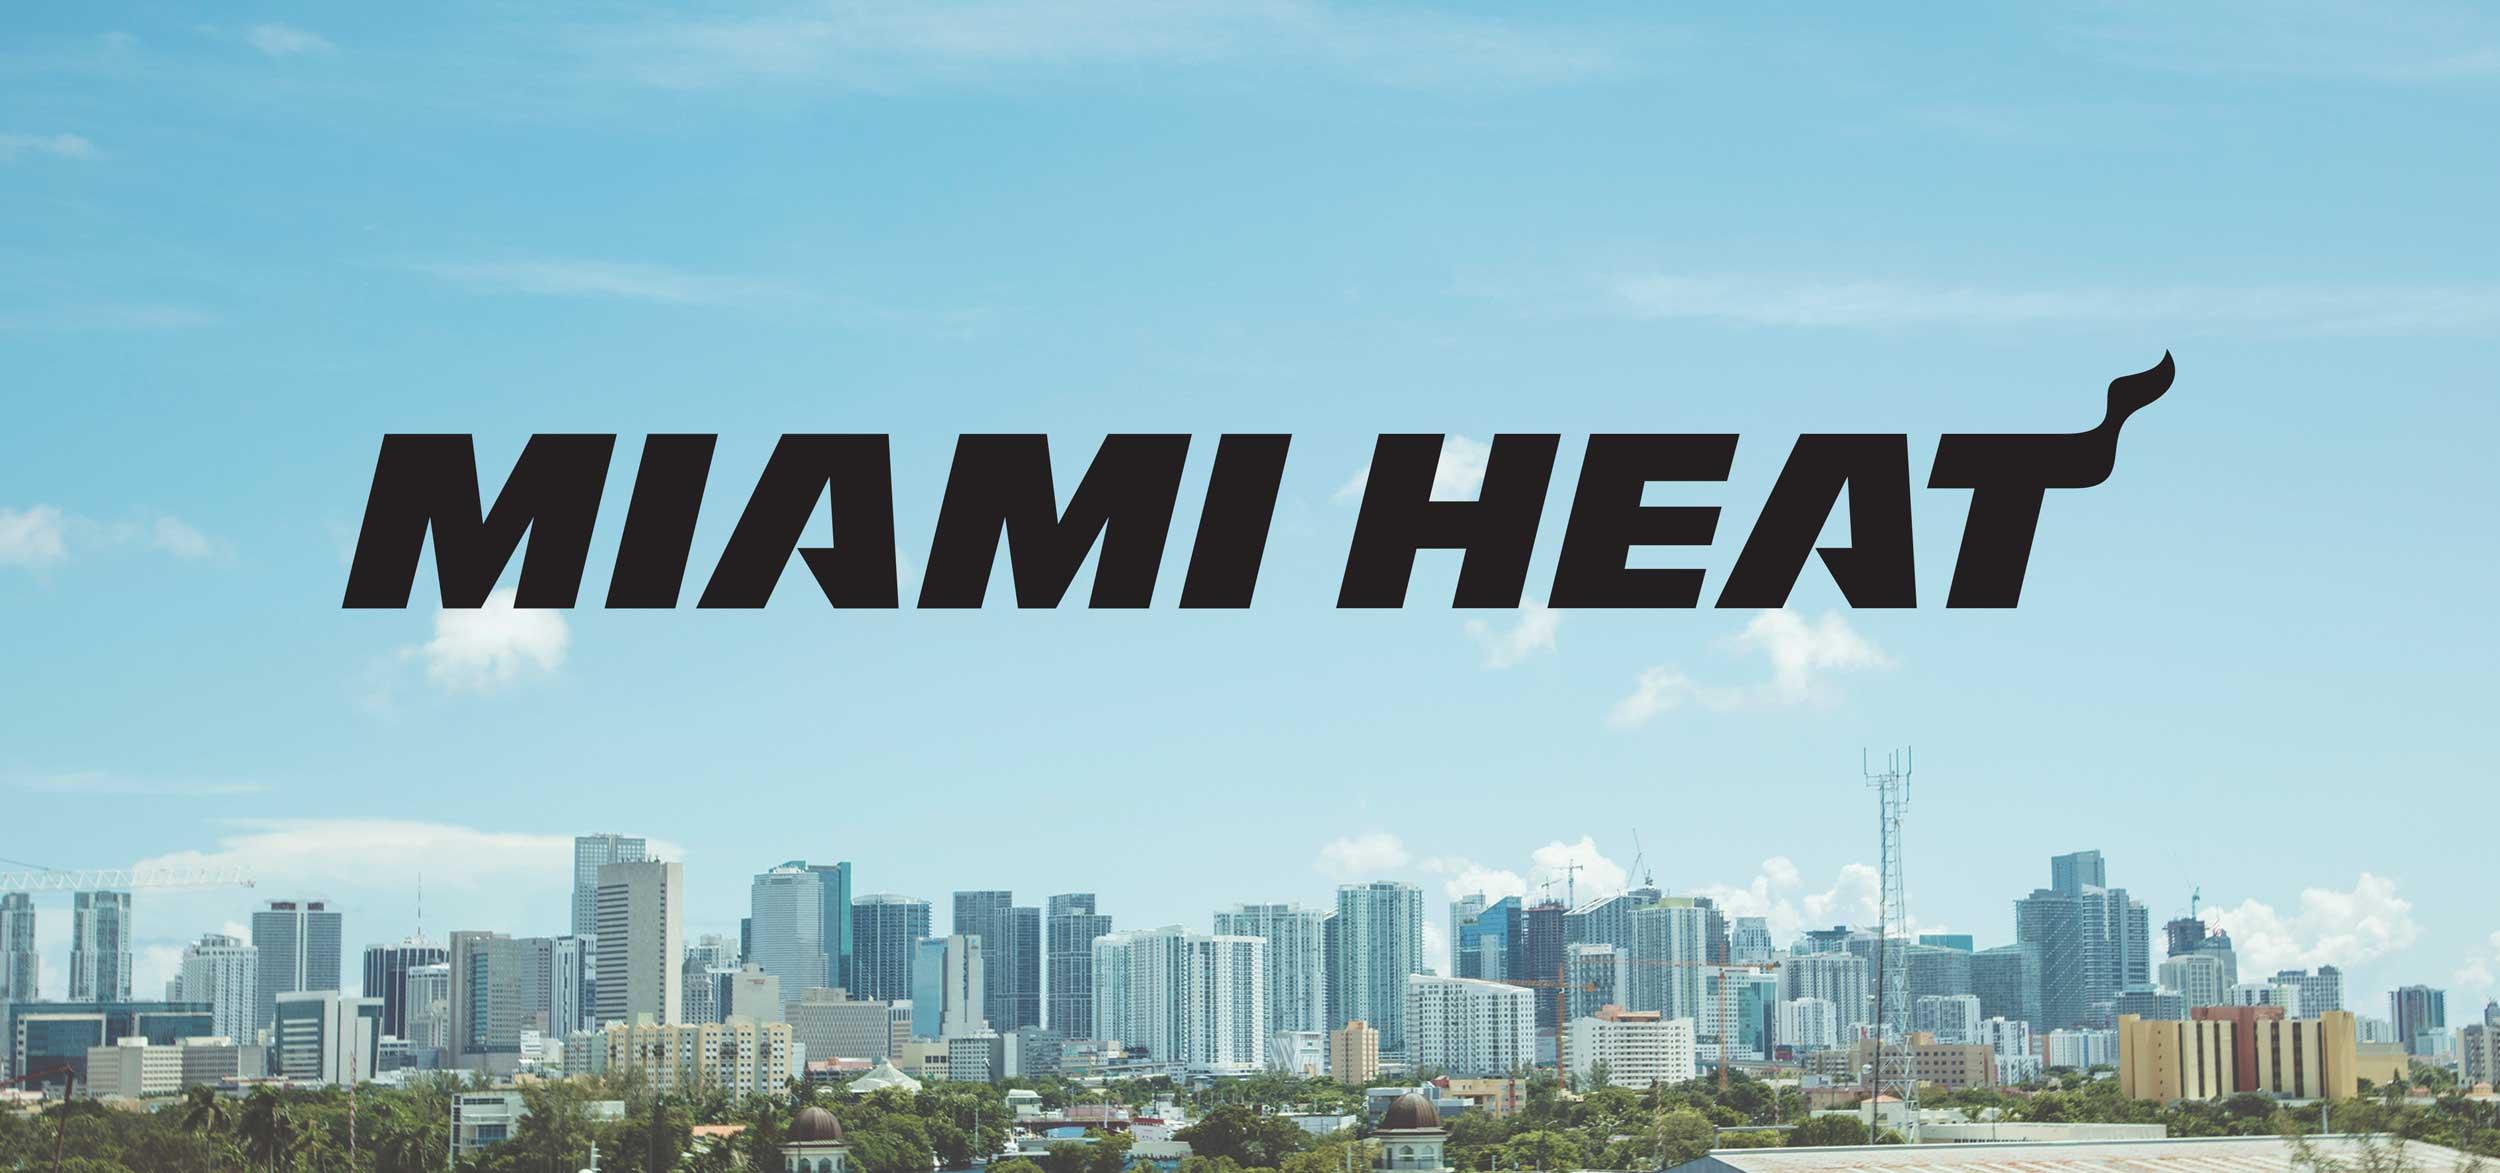 Miami Heat logo over the Miami skyline